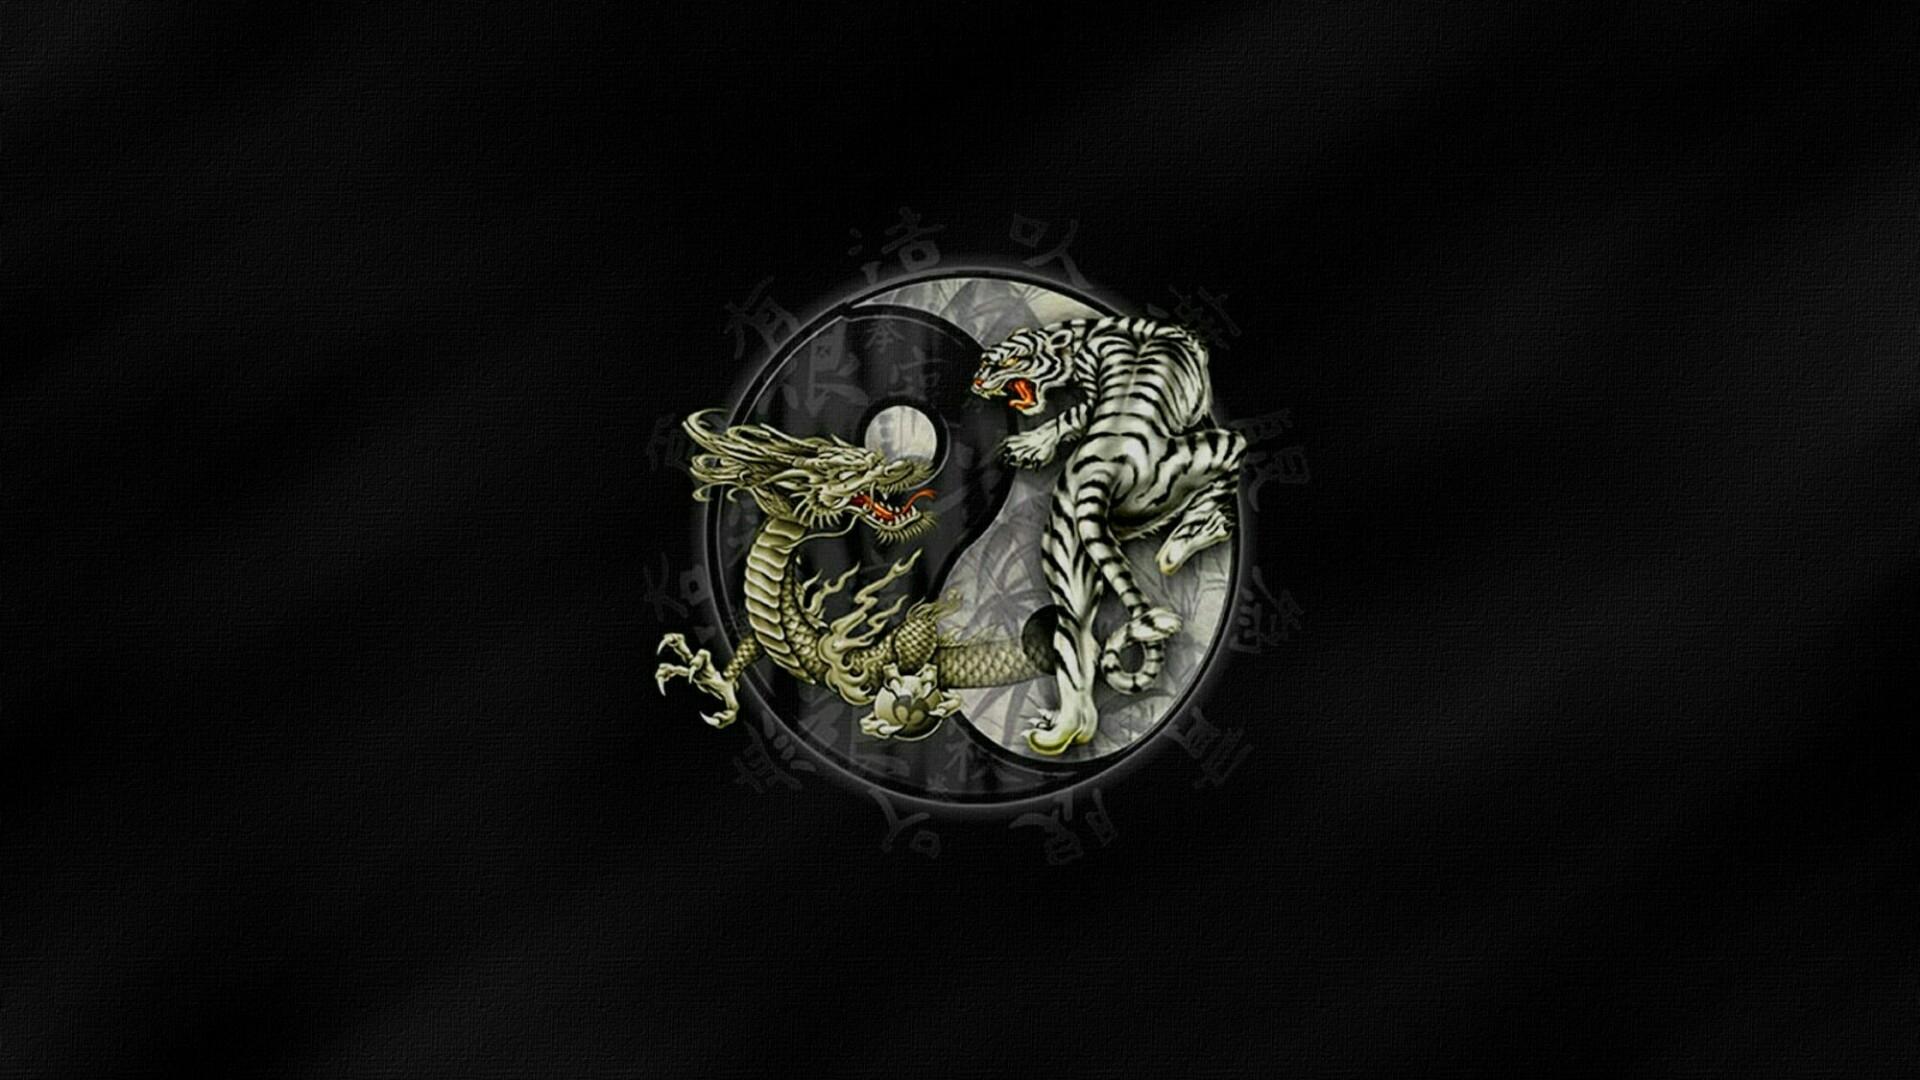 tiger and dragon yin and yang wallpaper | wallpaper studio 10 | tens